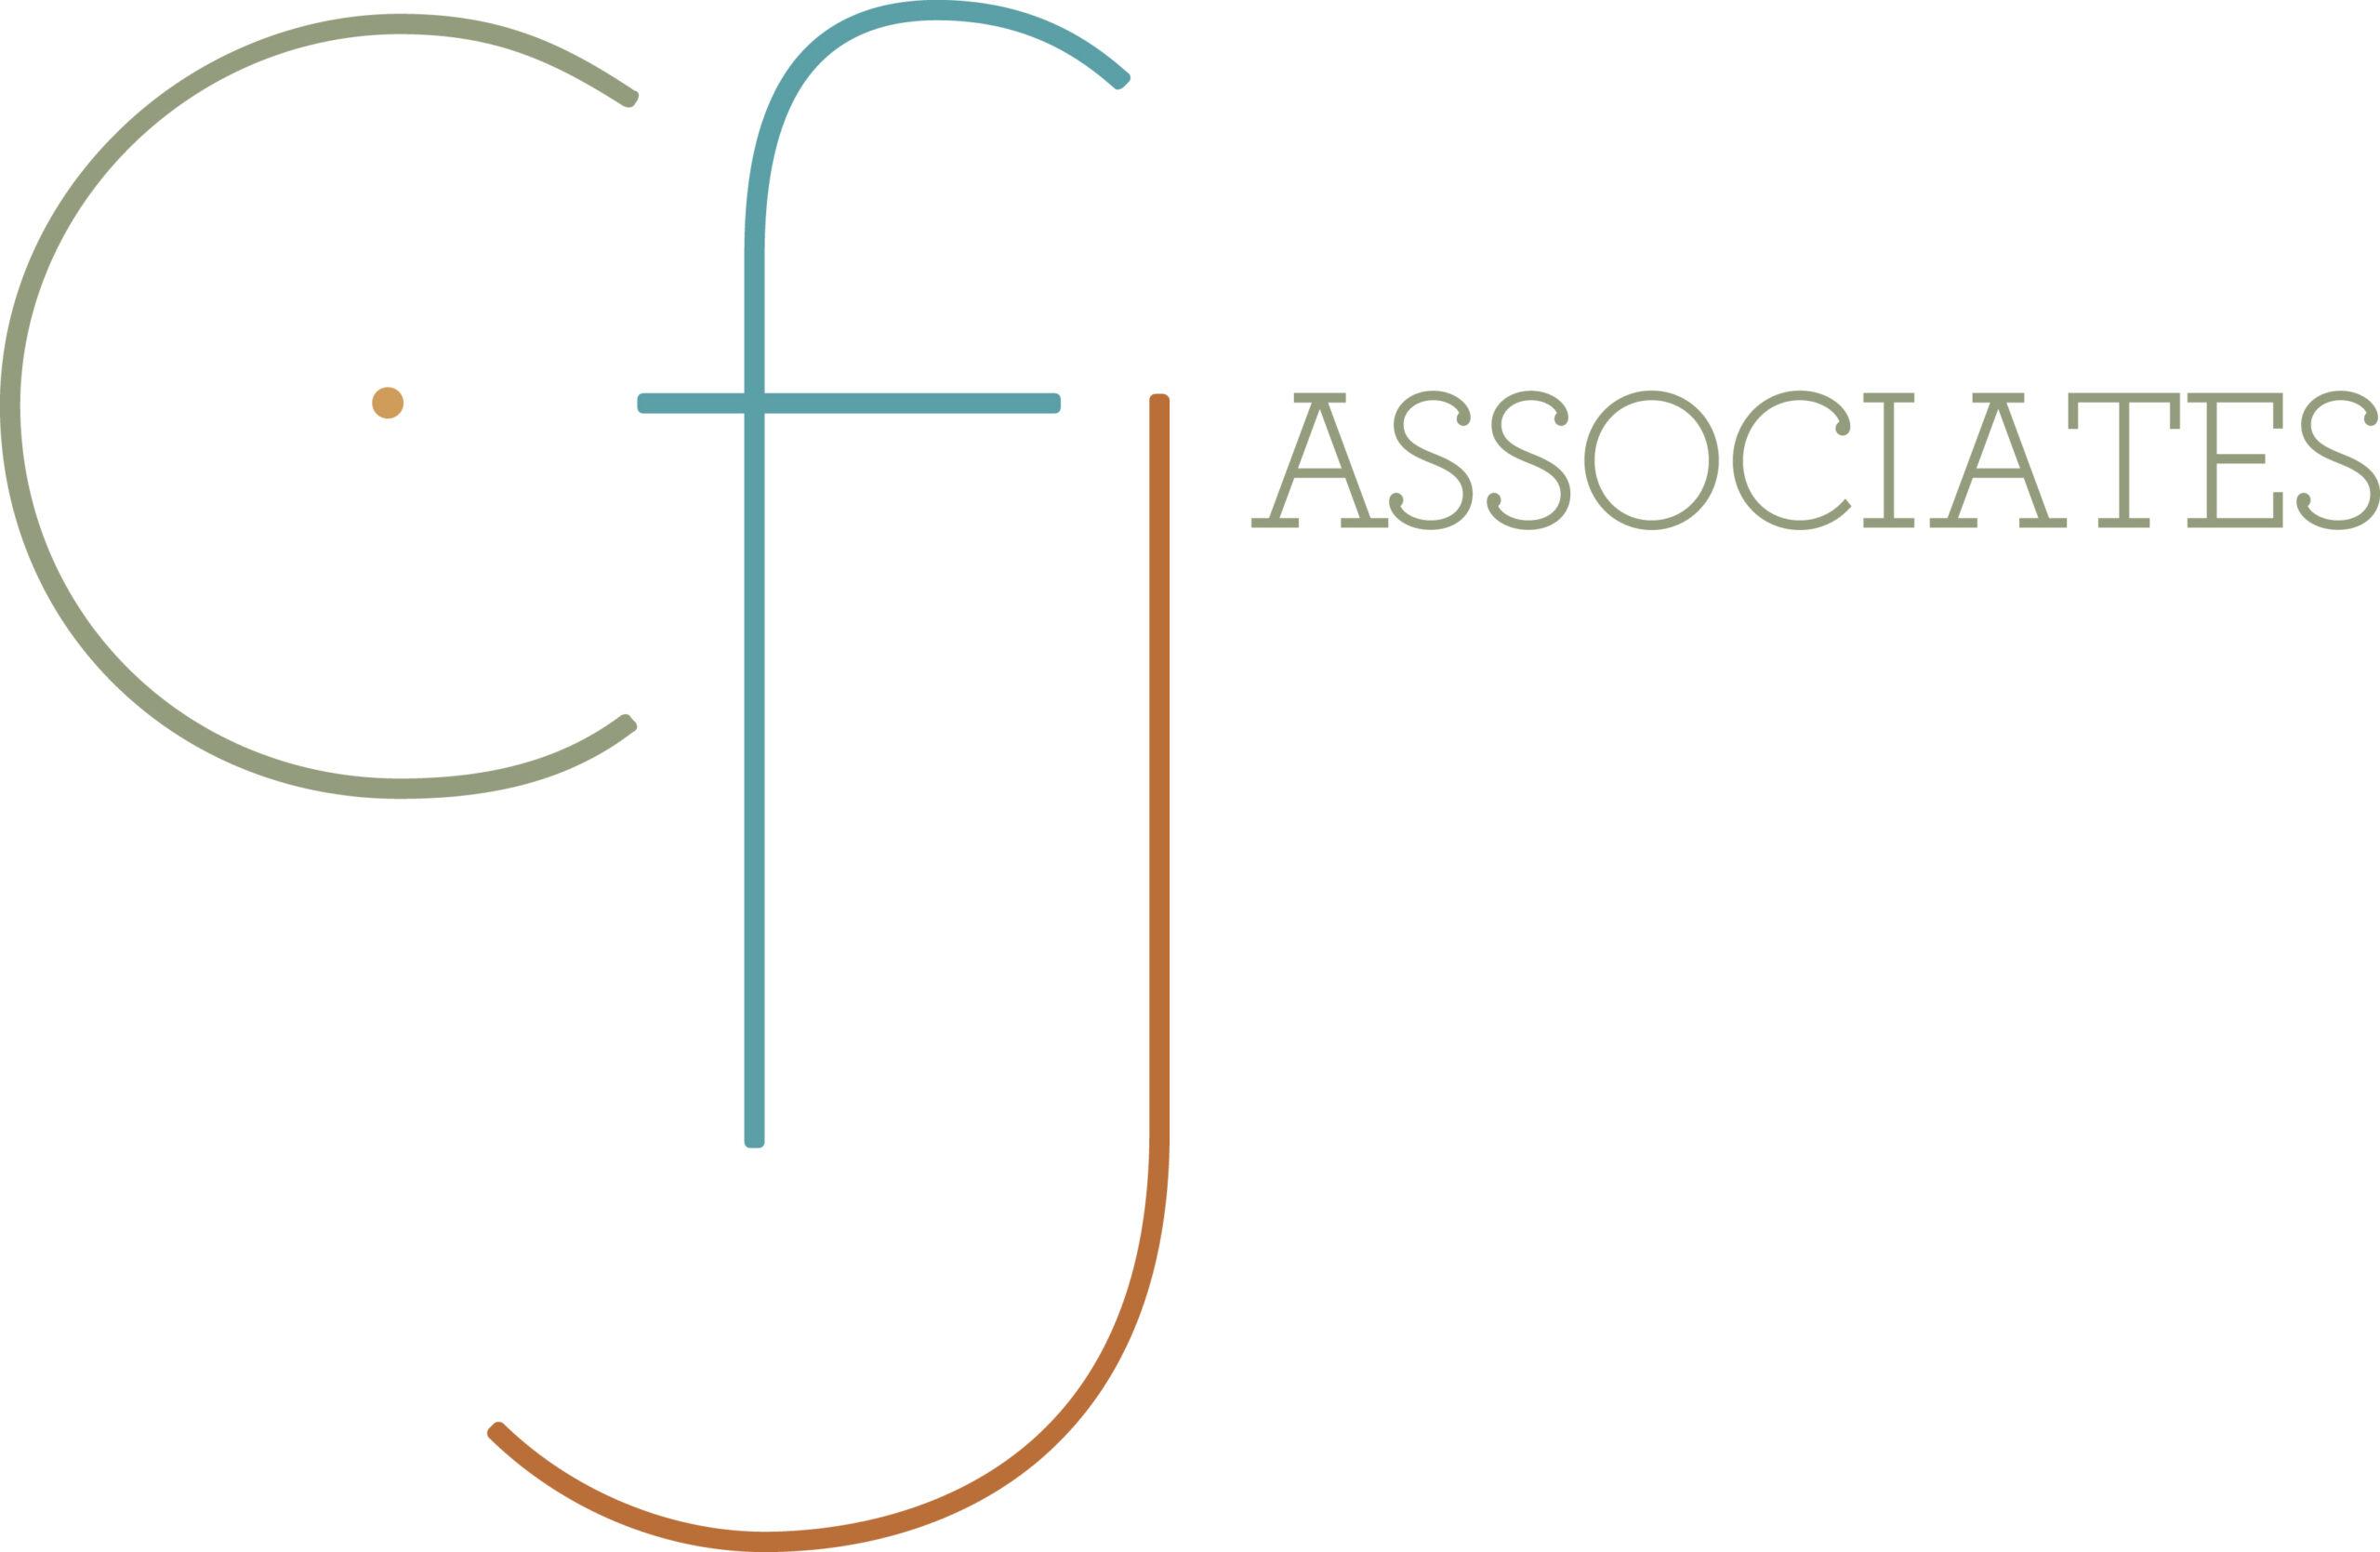 Image showing CFJ Associates